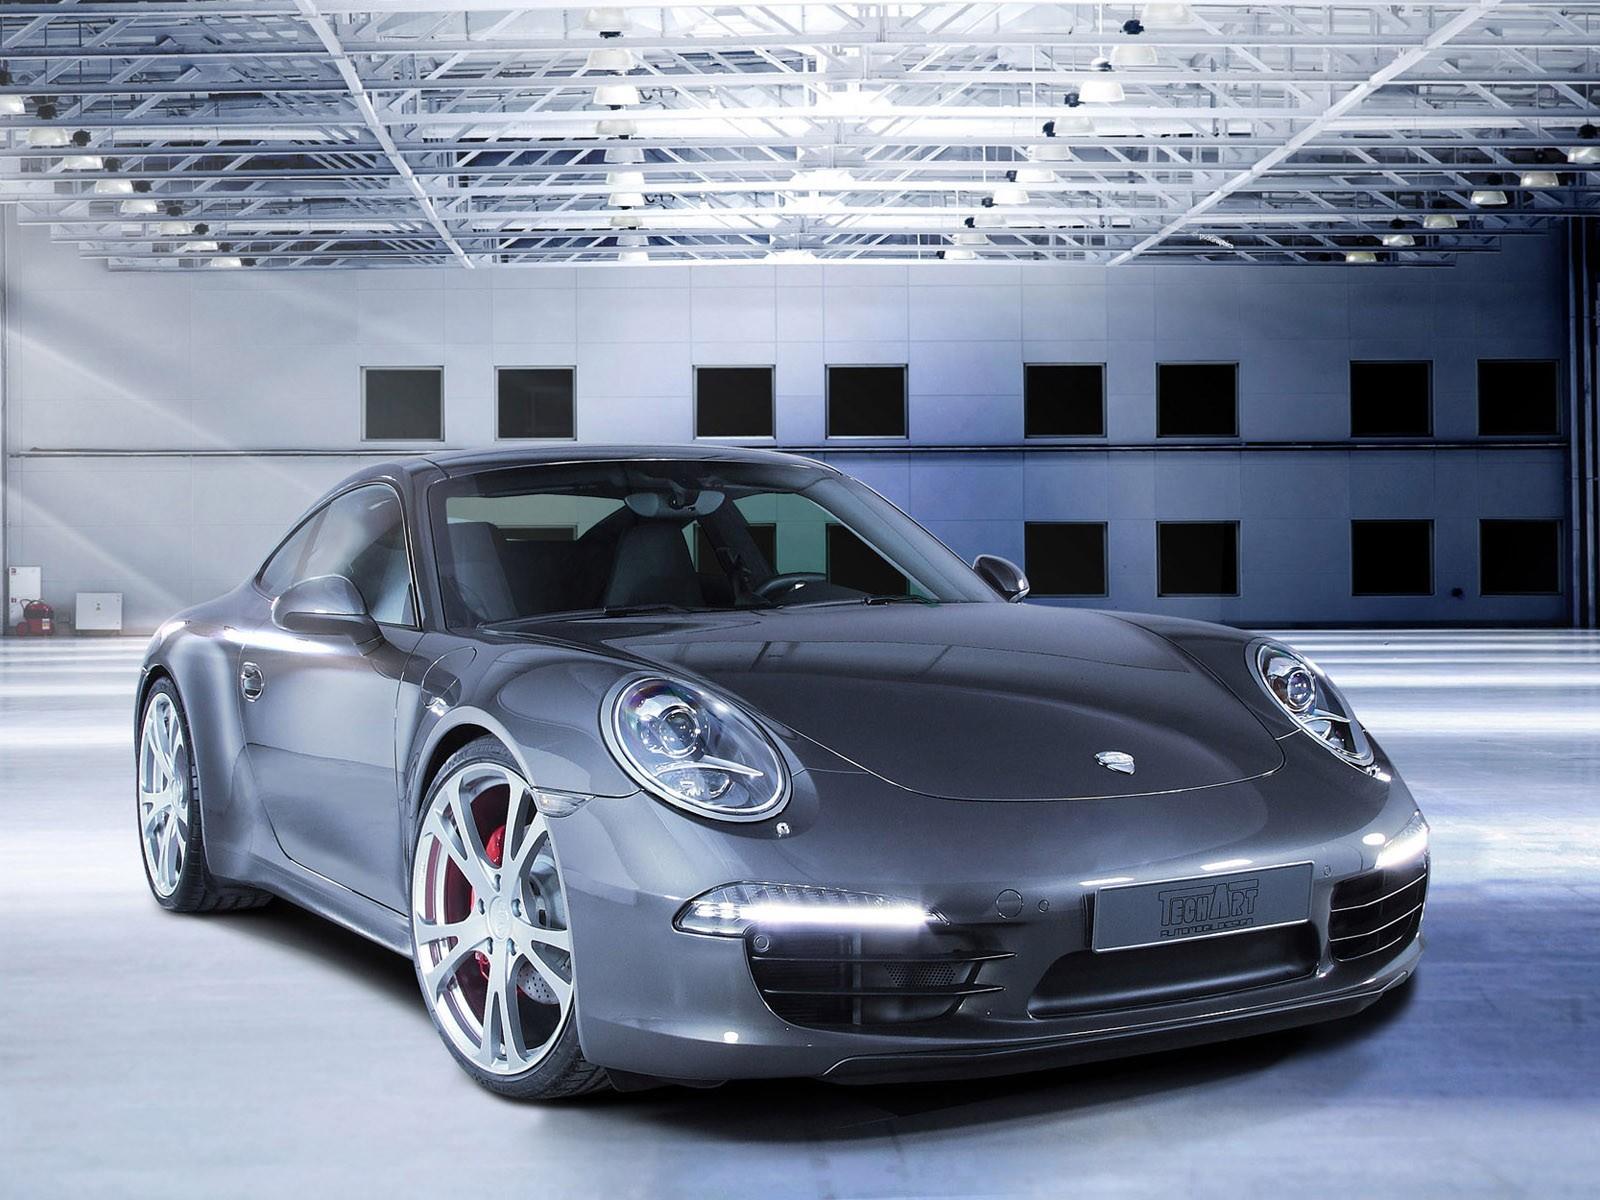 2012 techart porsche 911 carrera